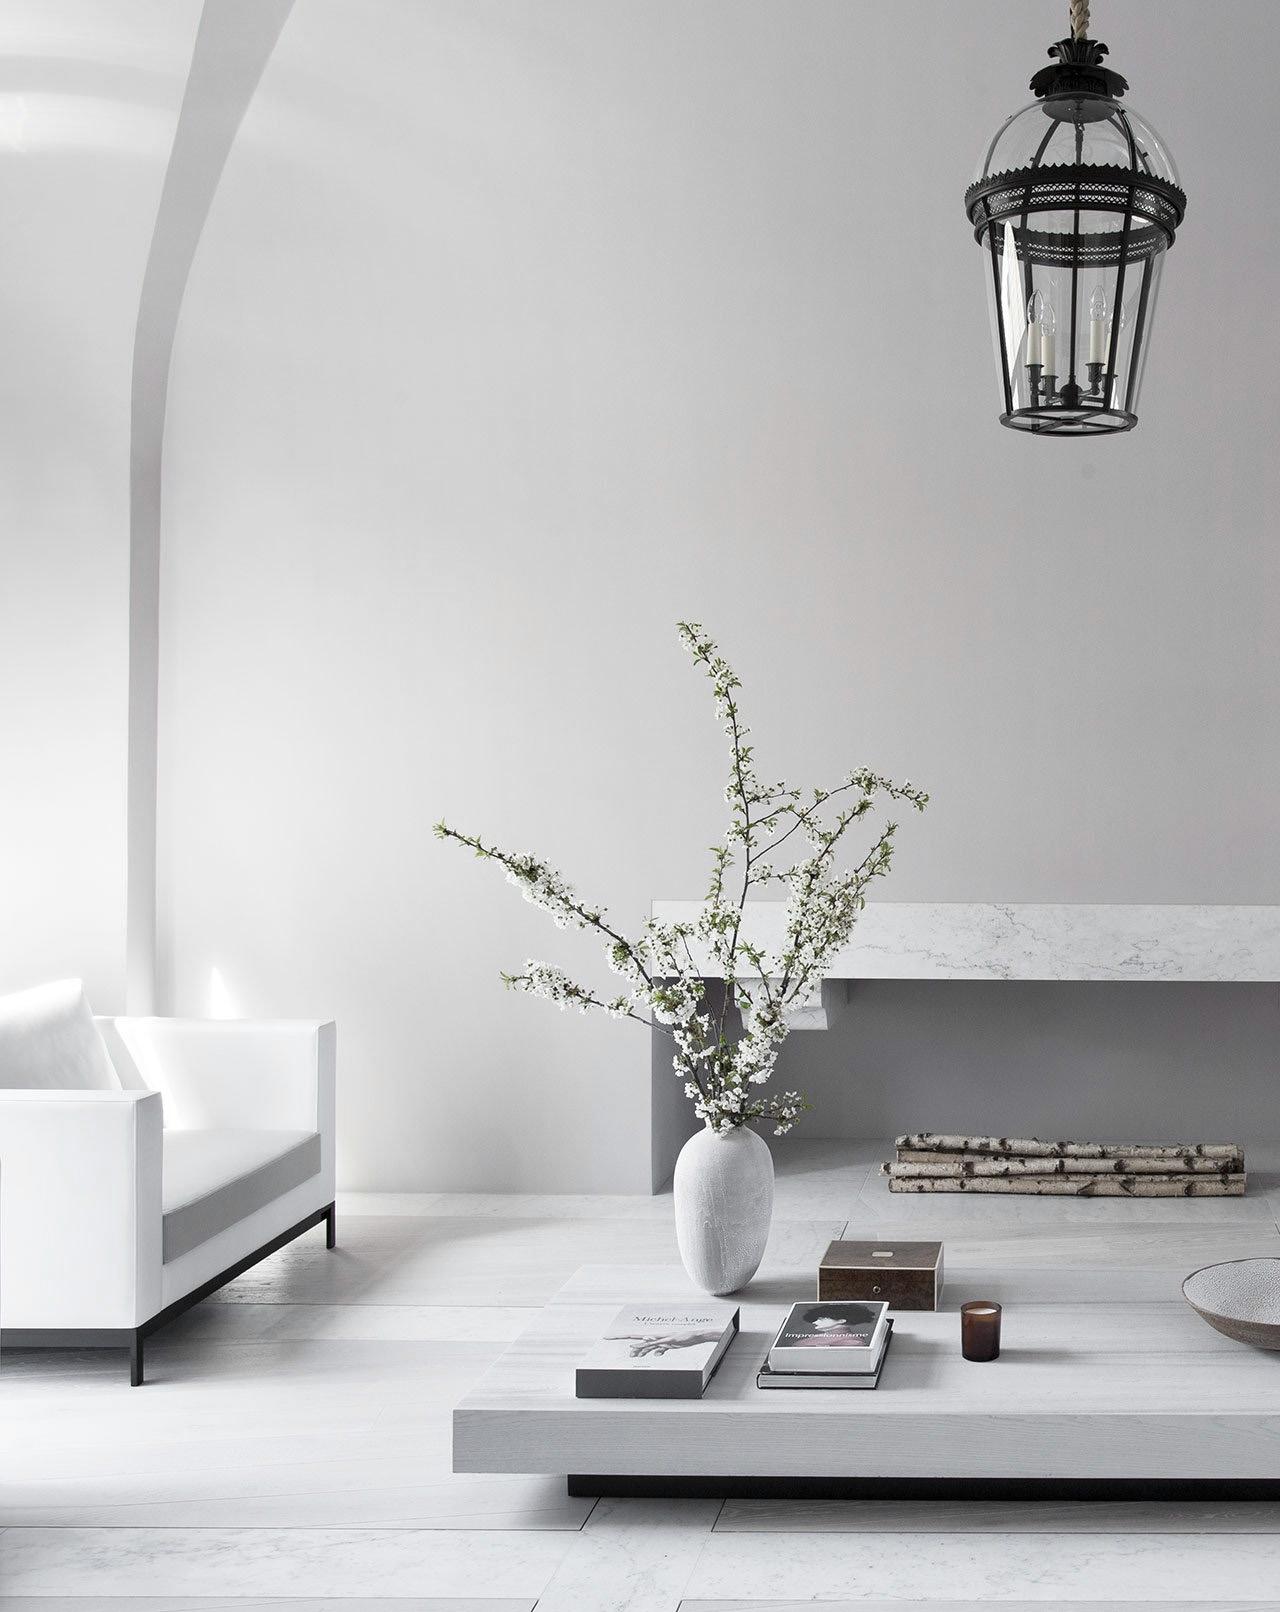 visit Paris wonderfully elegant - minimalissimo | ello